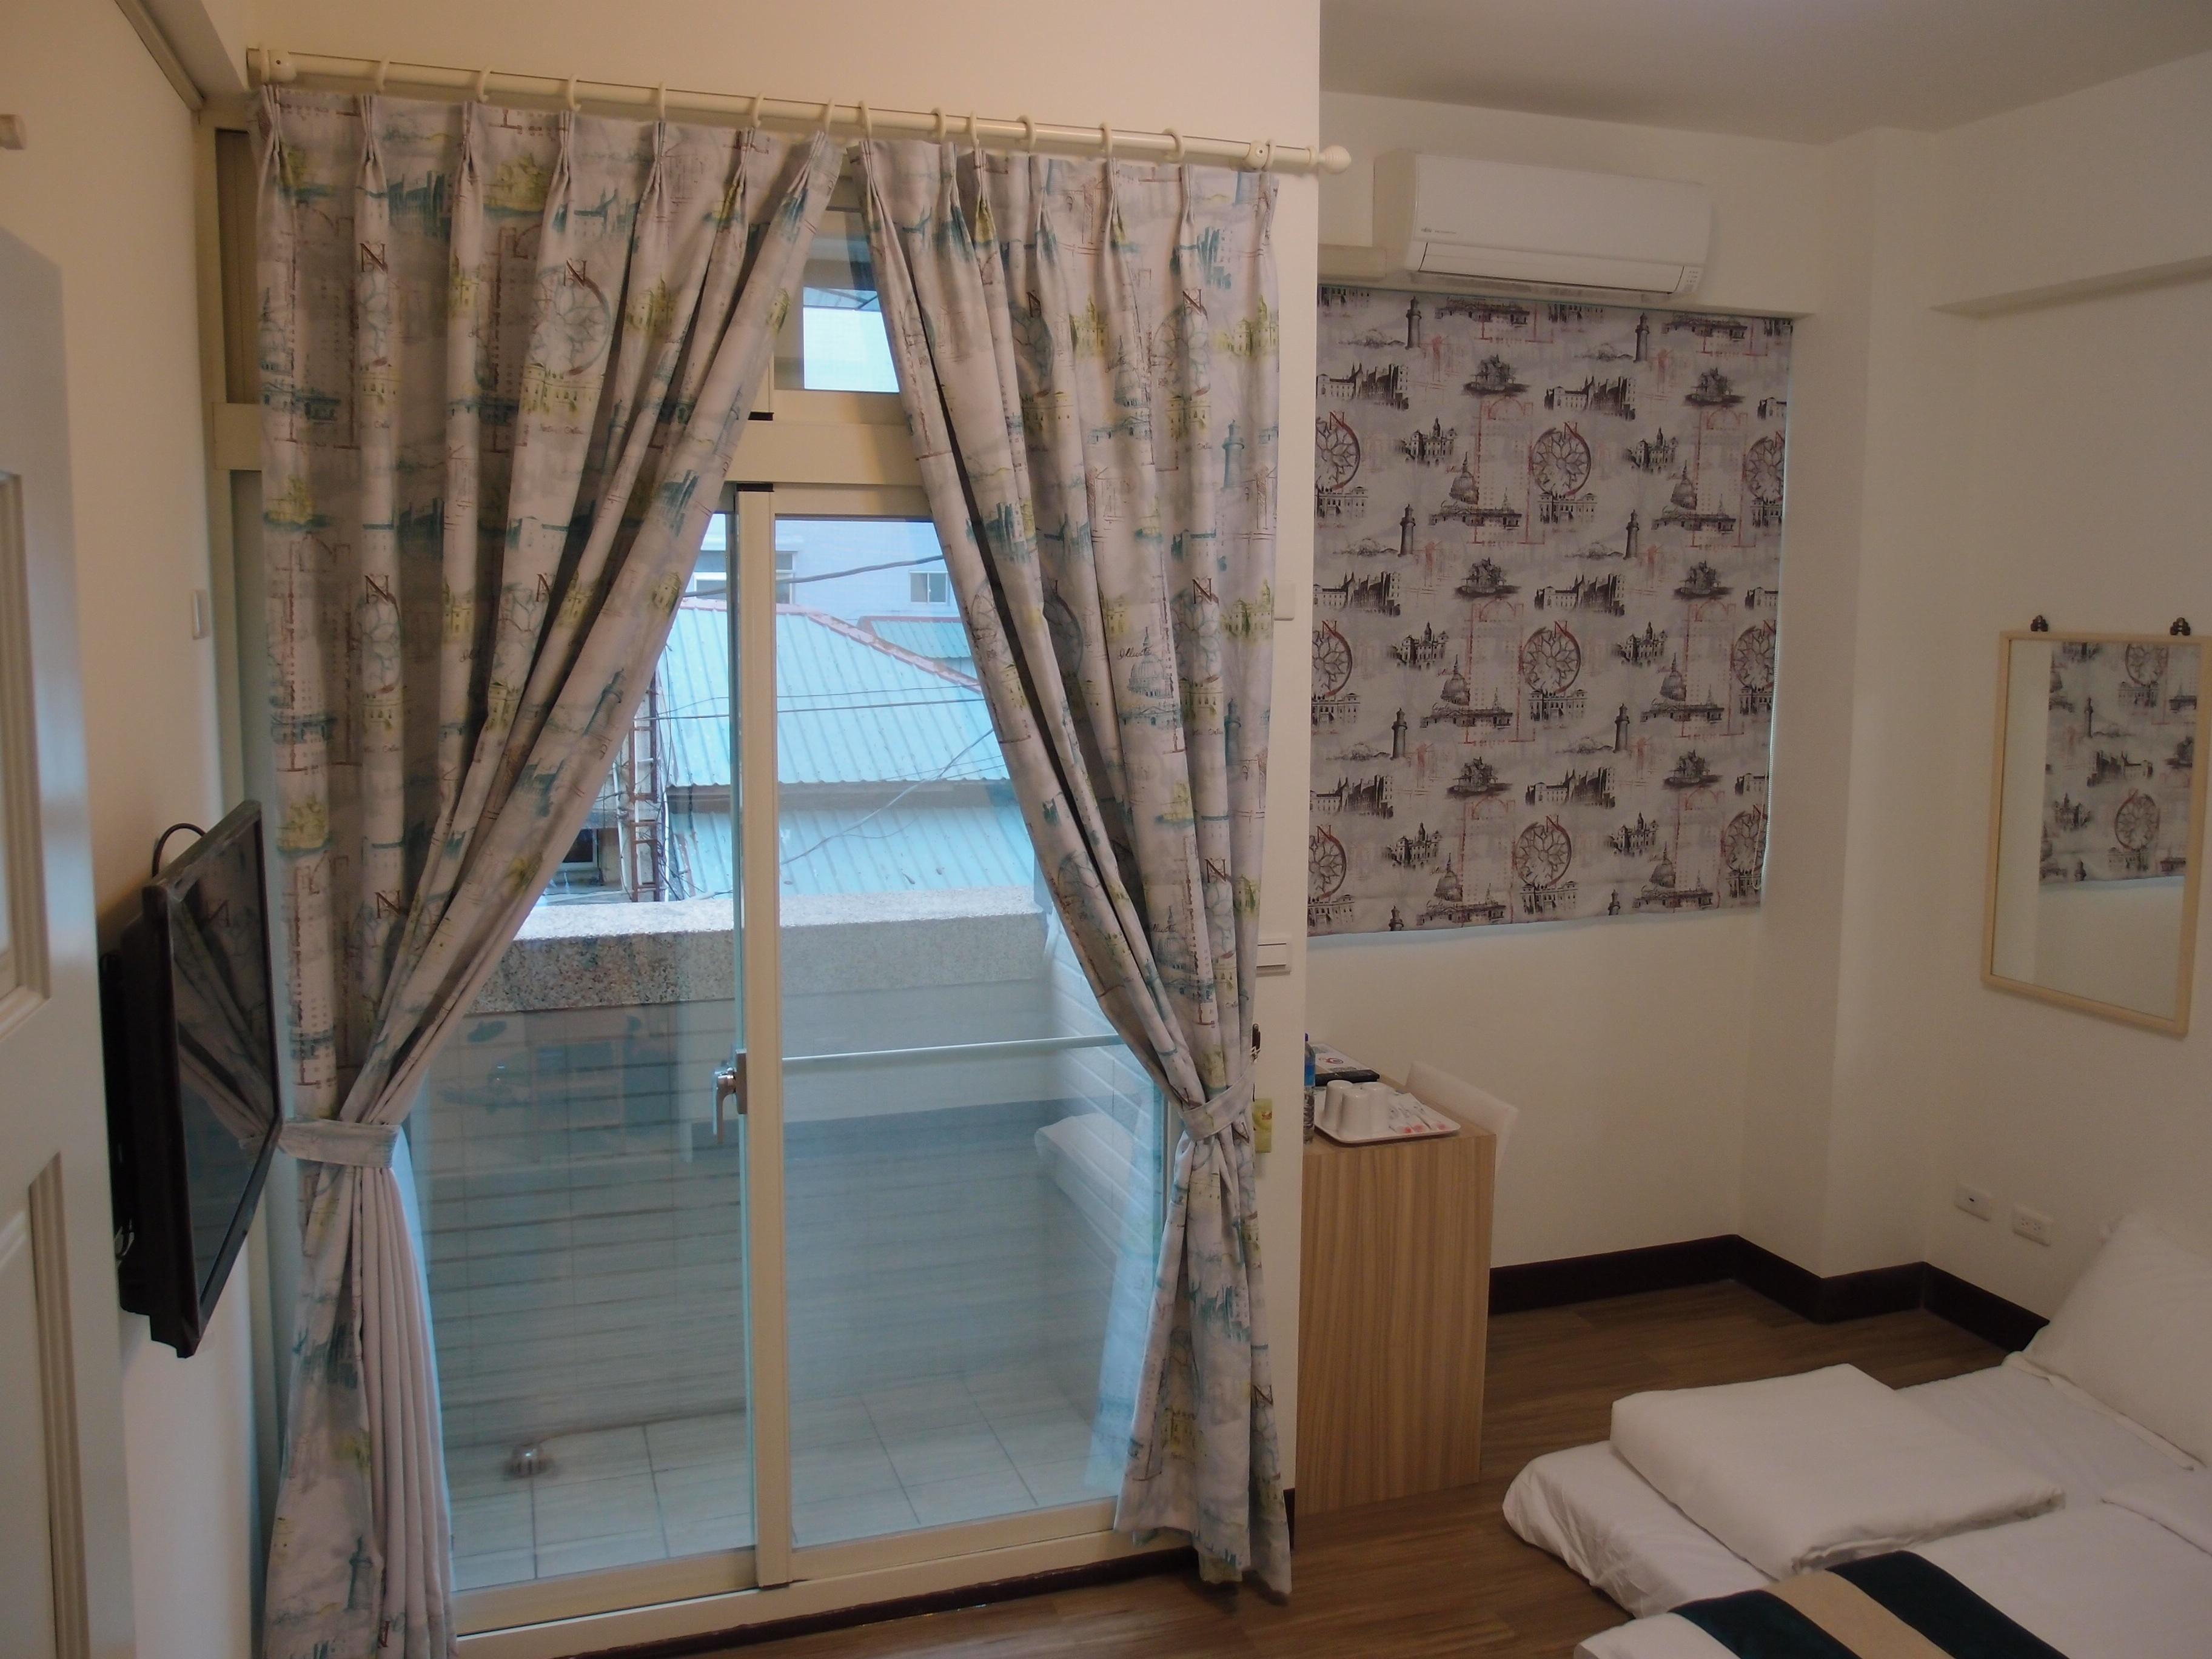 Banco de imagens ch o casa chal cortina propriedade for Cortinas baratas para habitacion